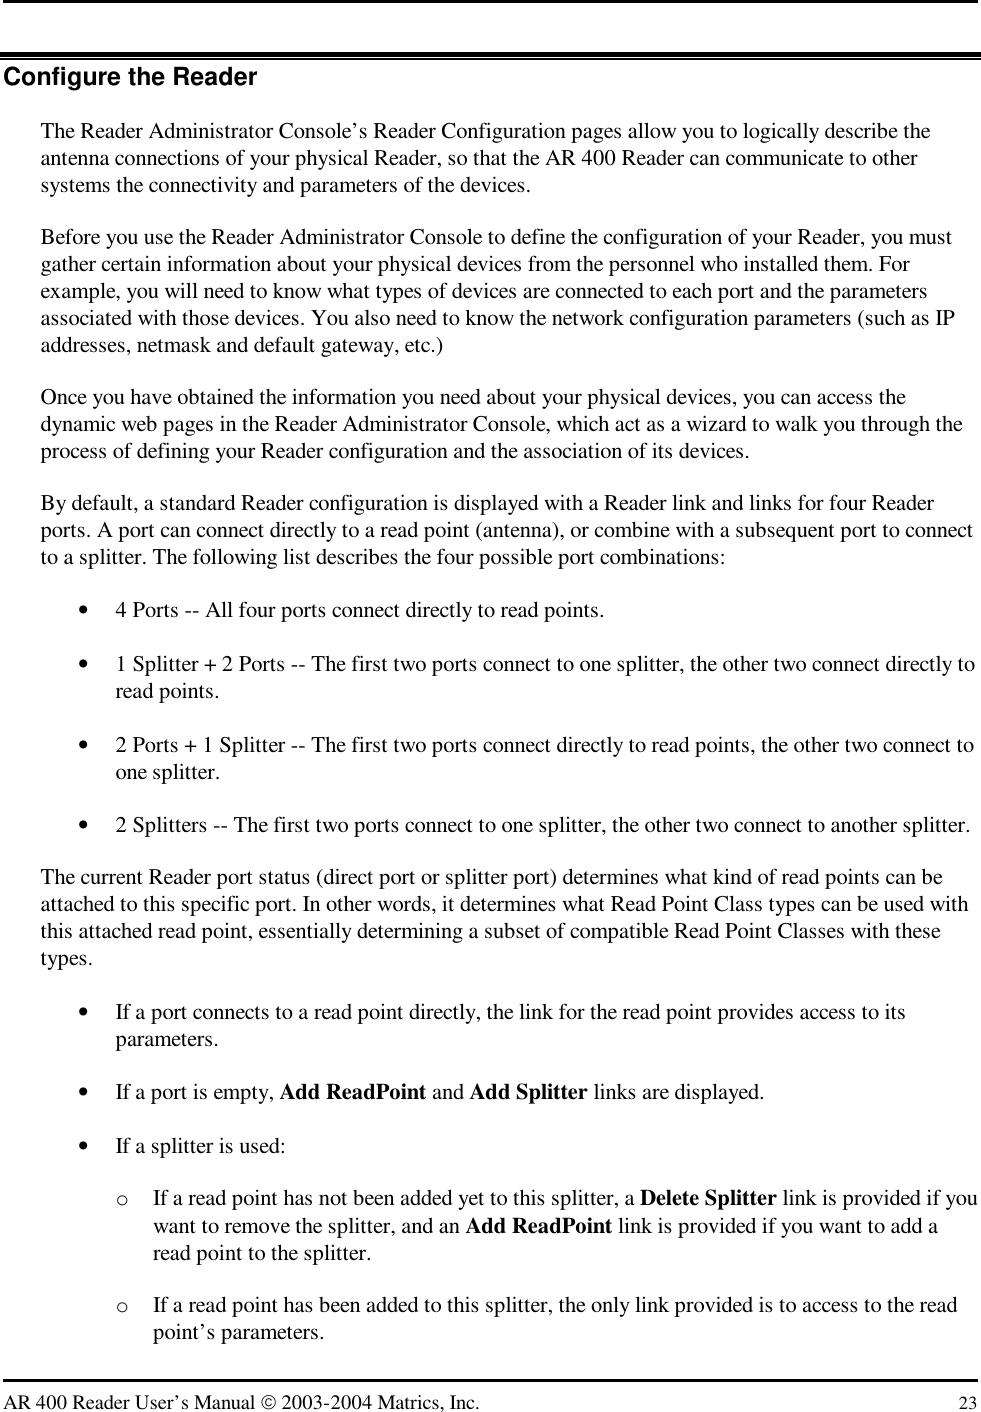 Symbol Technologies AR400US FHSS RFID Reader User Manual AR